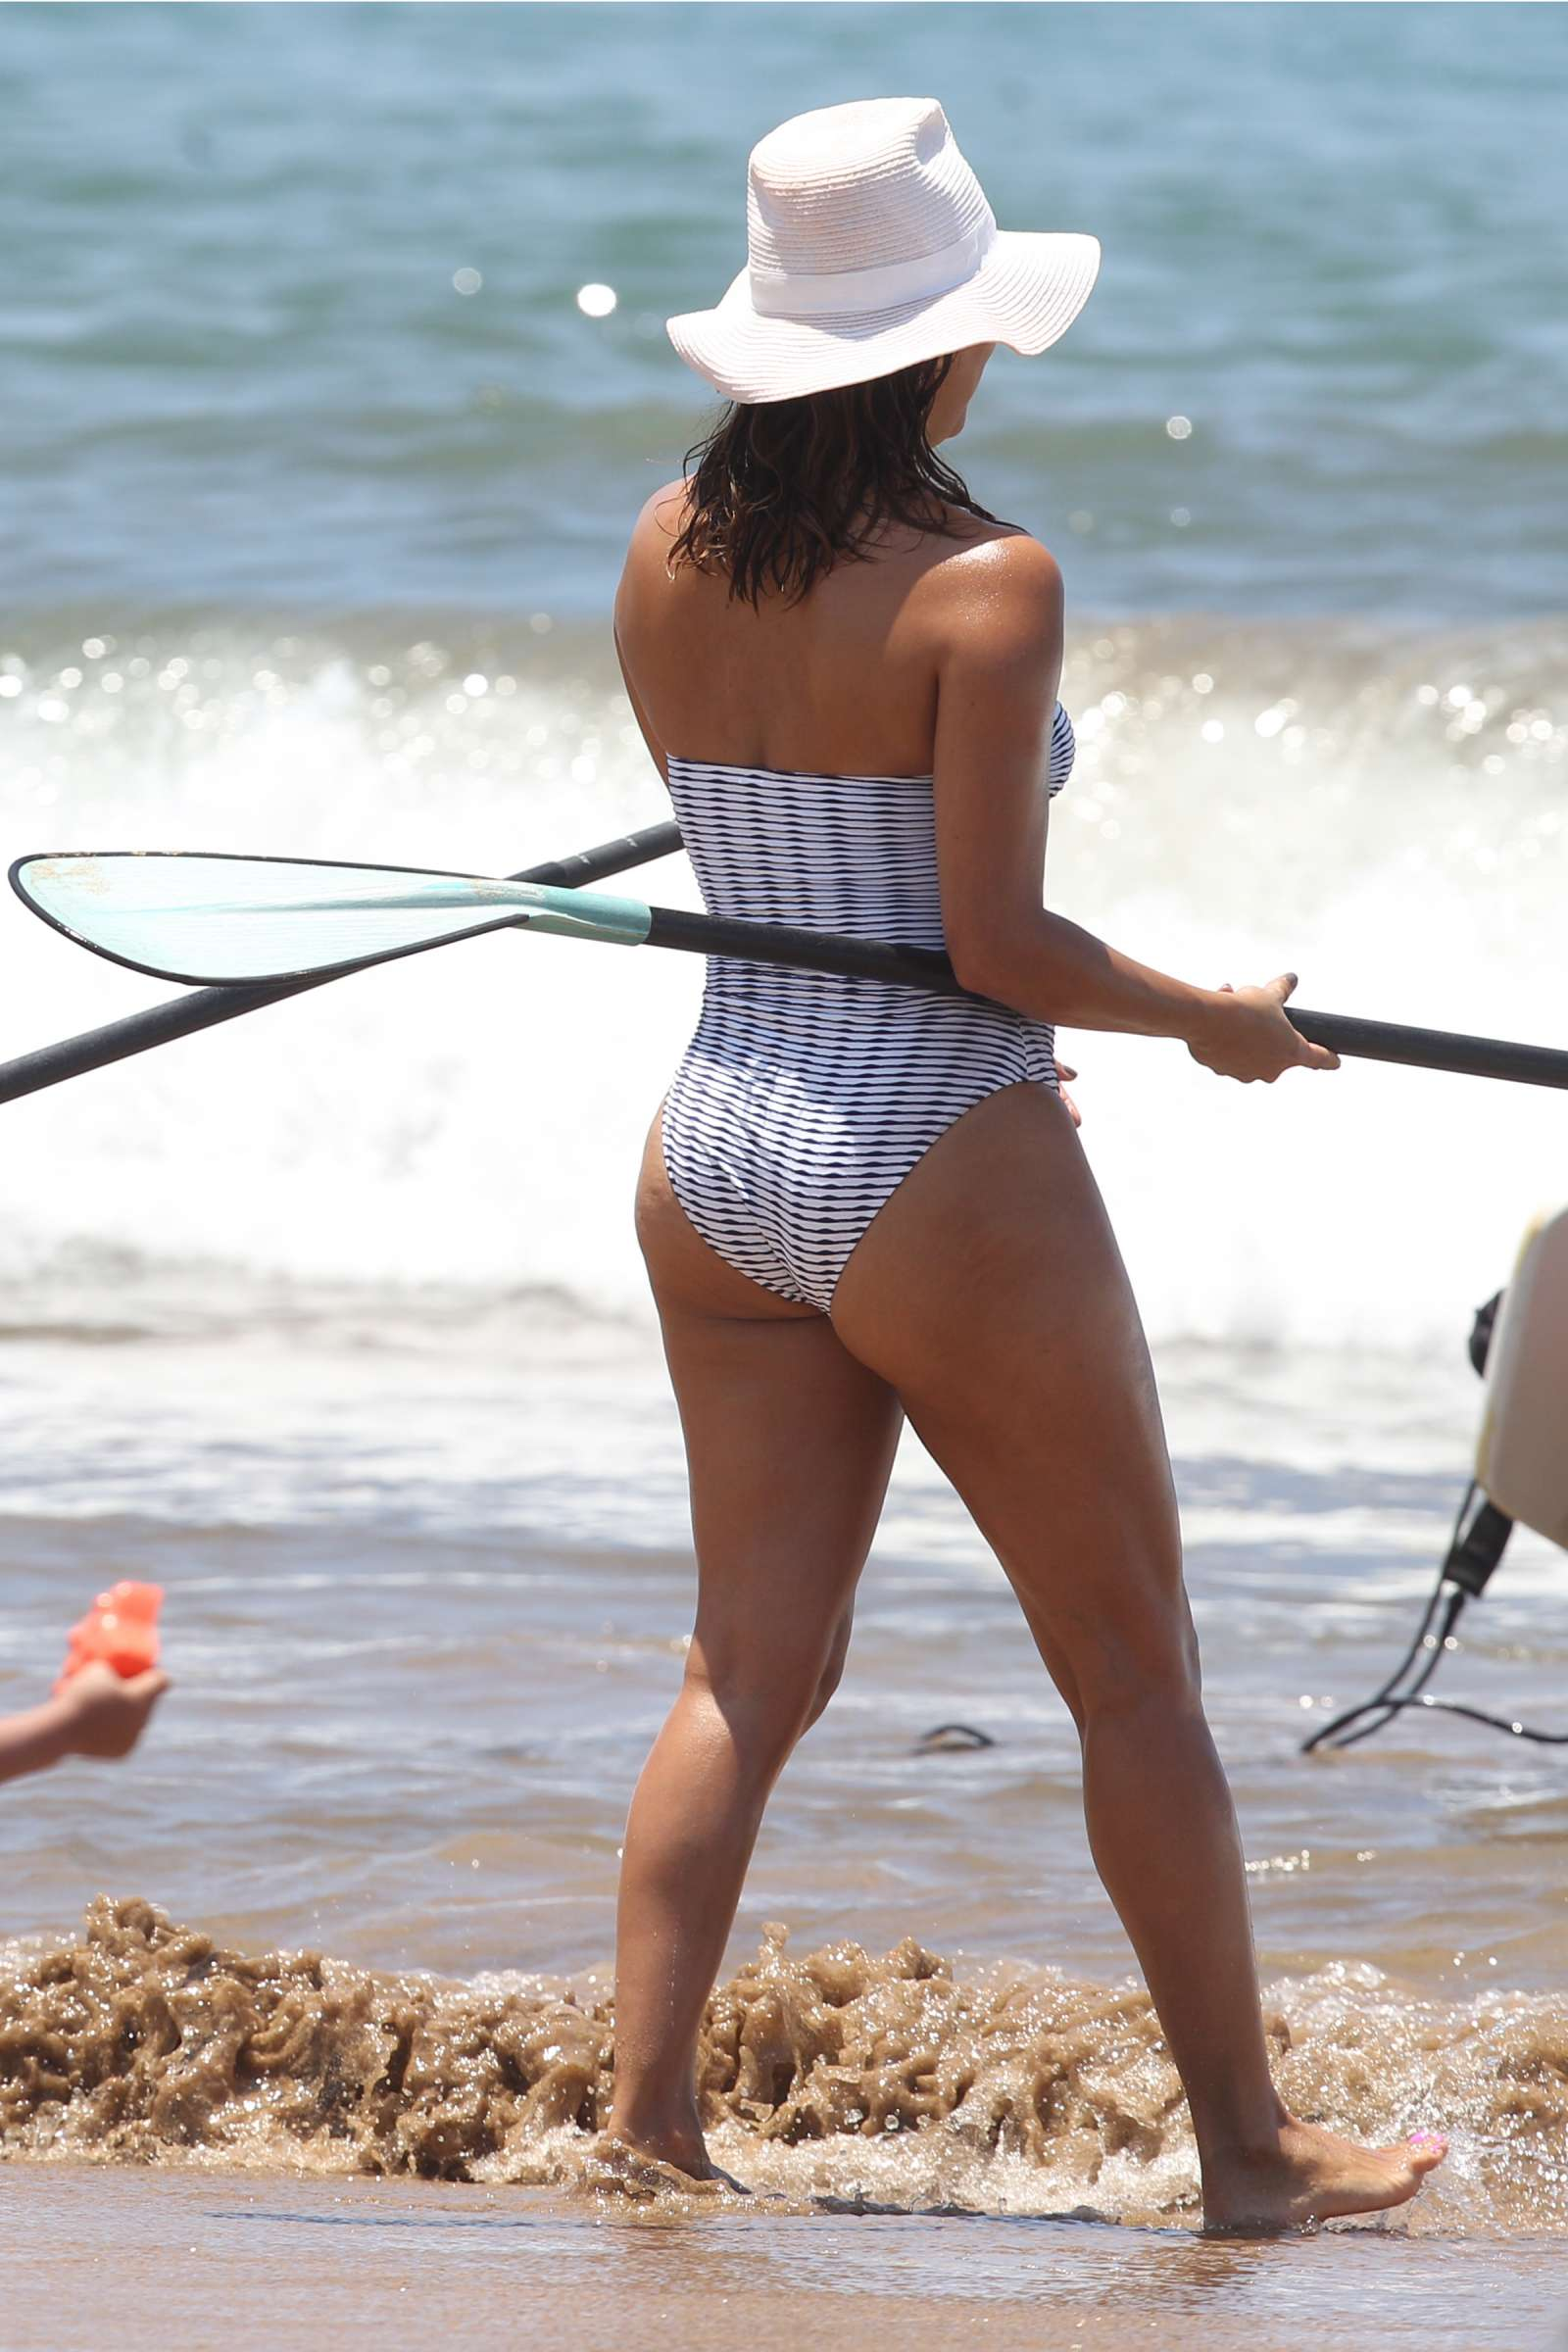 Lucette Romy Nude Photos and Videos,Federica nargi booty in bikini at beach in mykonos Erotic clip Olivia Wilde Topless Selfie Leaked,Mia malkova